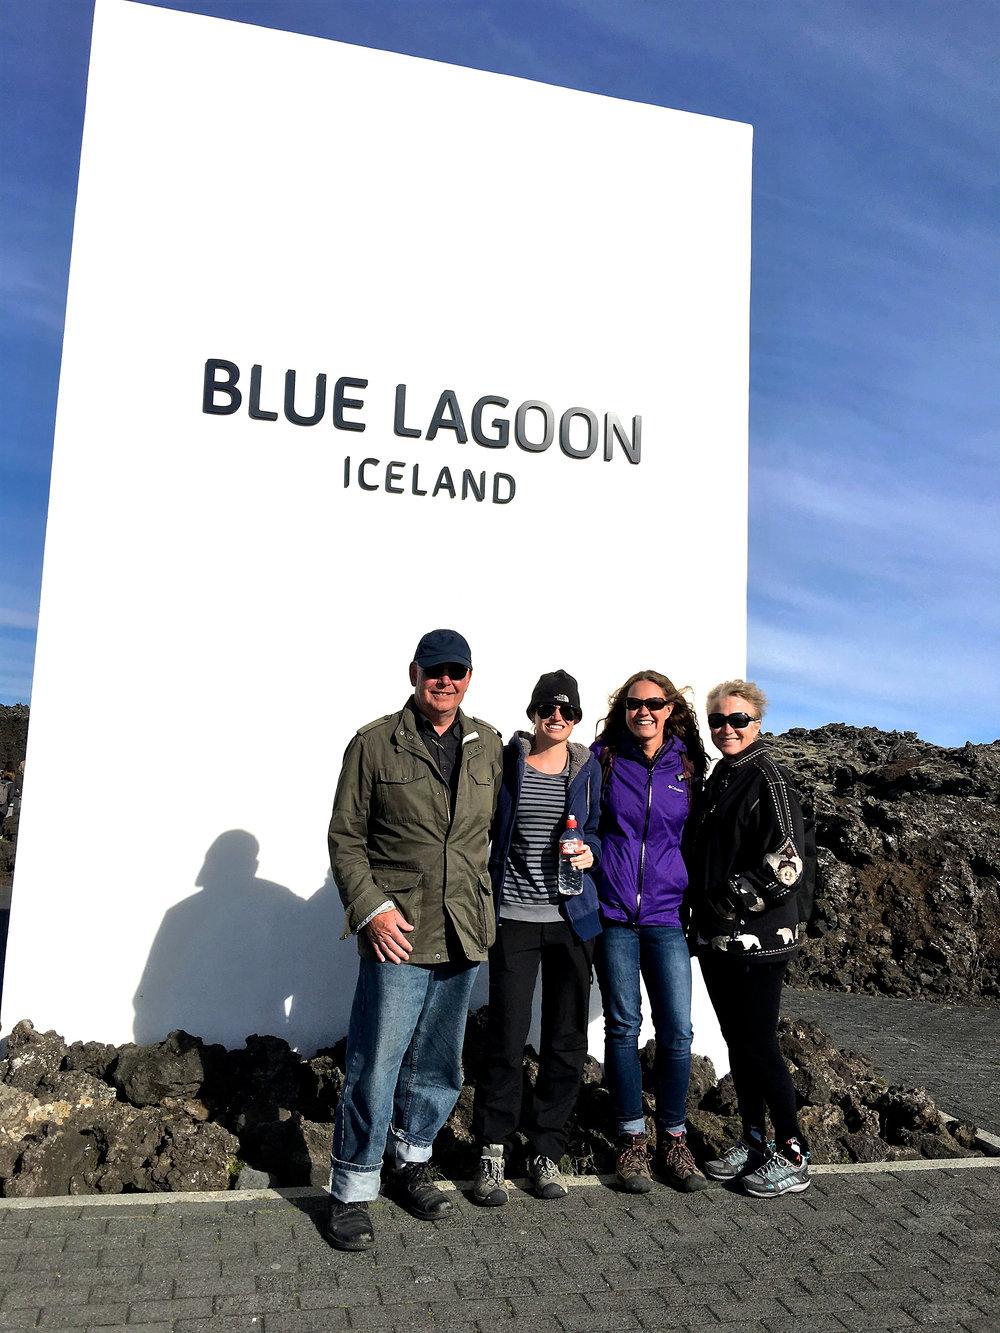 teri_iceland_bluelagoon_spiritedtable_photo14.jpg